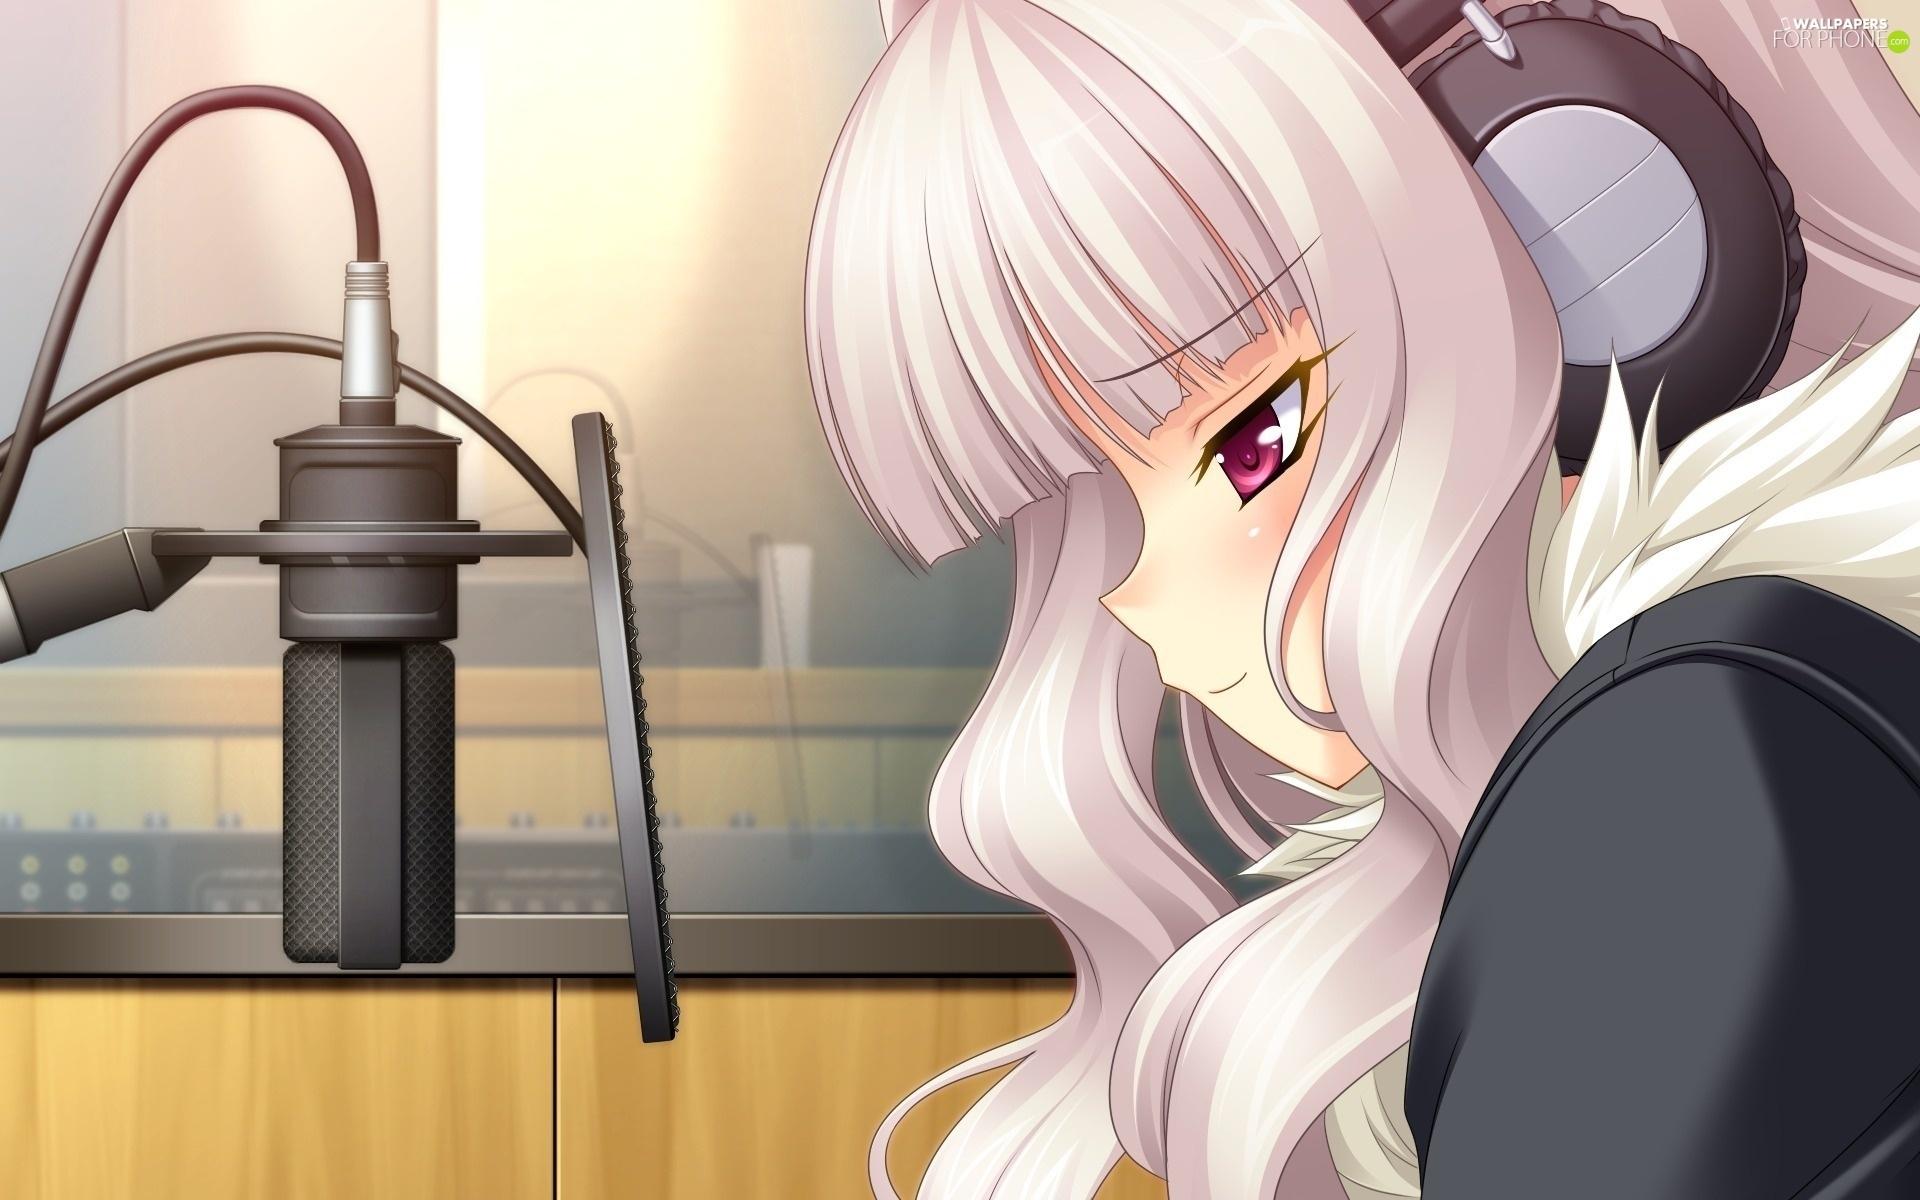 Headphone Girls Night Hd Wallpapers 1920x1080 Manga Anime Girl Headphones Mike For Phone